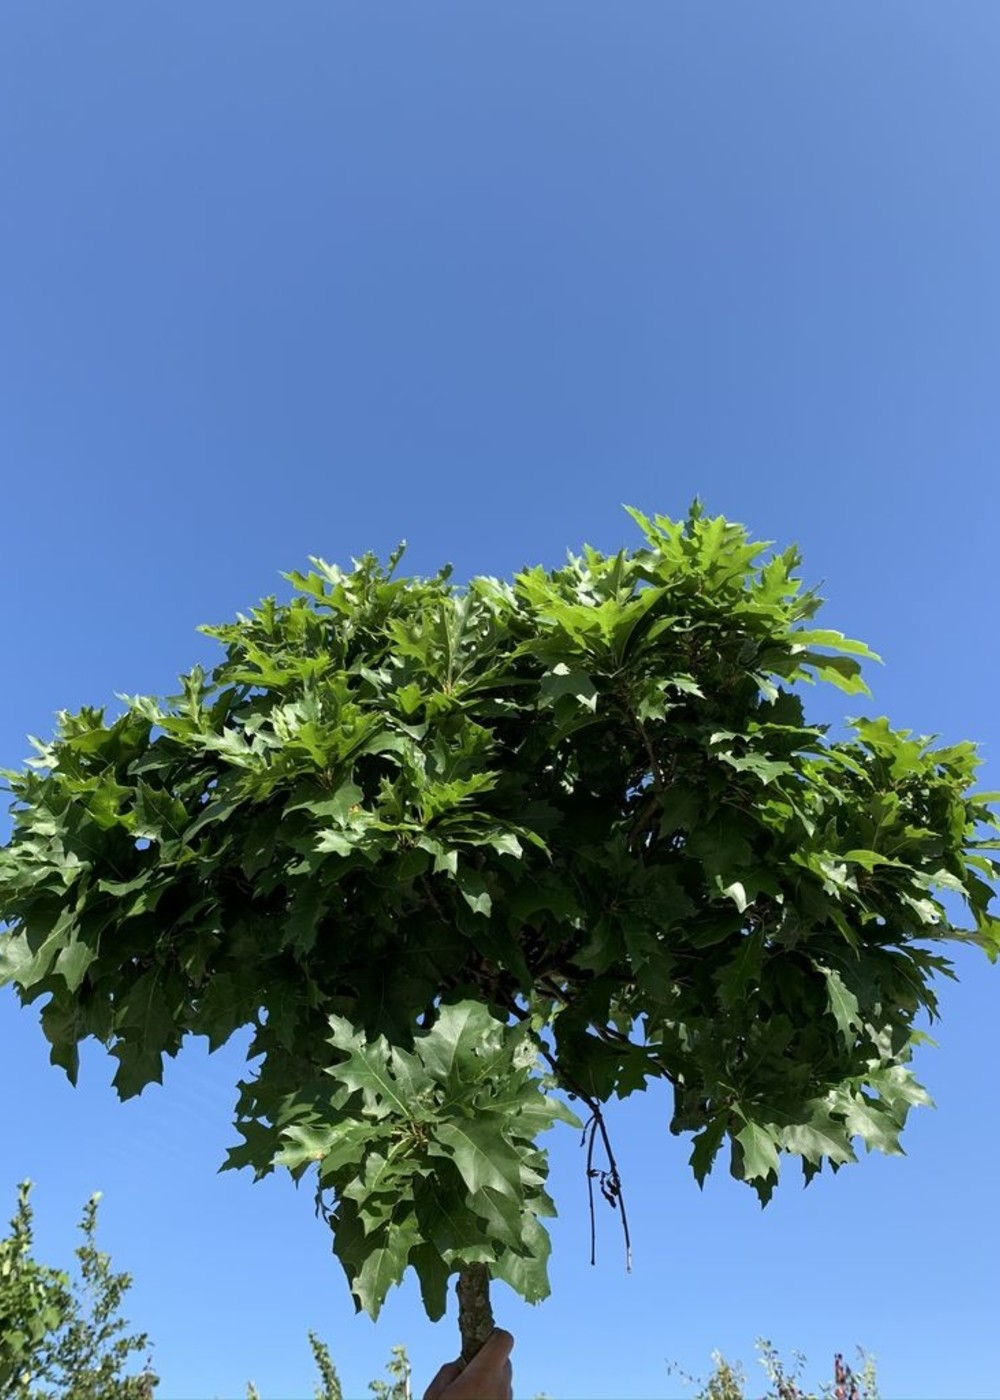 Sumpf-Eiche Green Dwarf | Quercus palustris 'Green Dwarf'